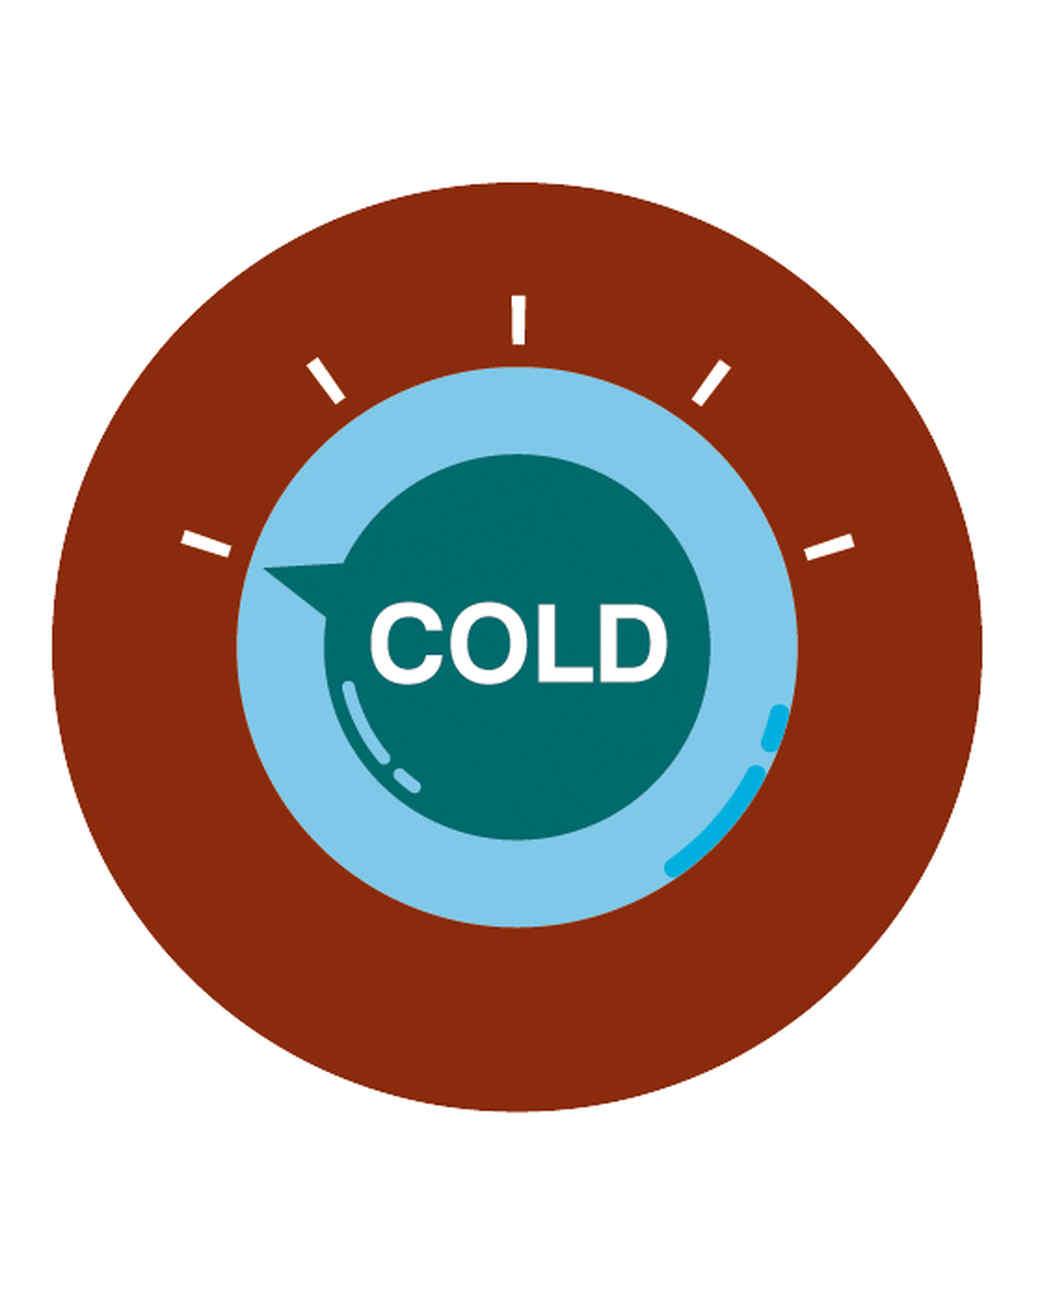 cold-icon.jpg